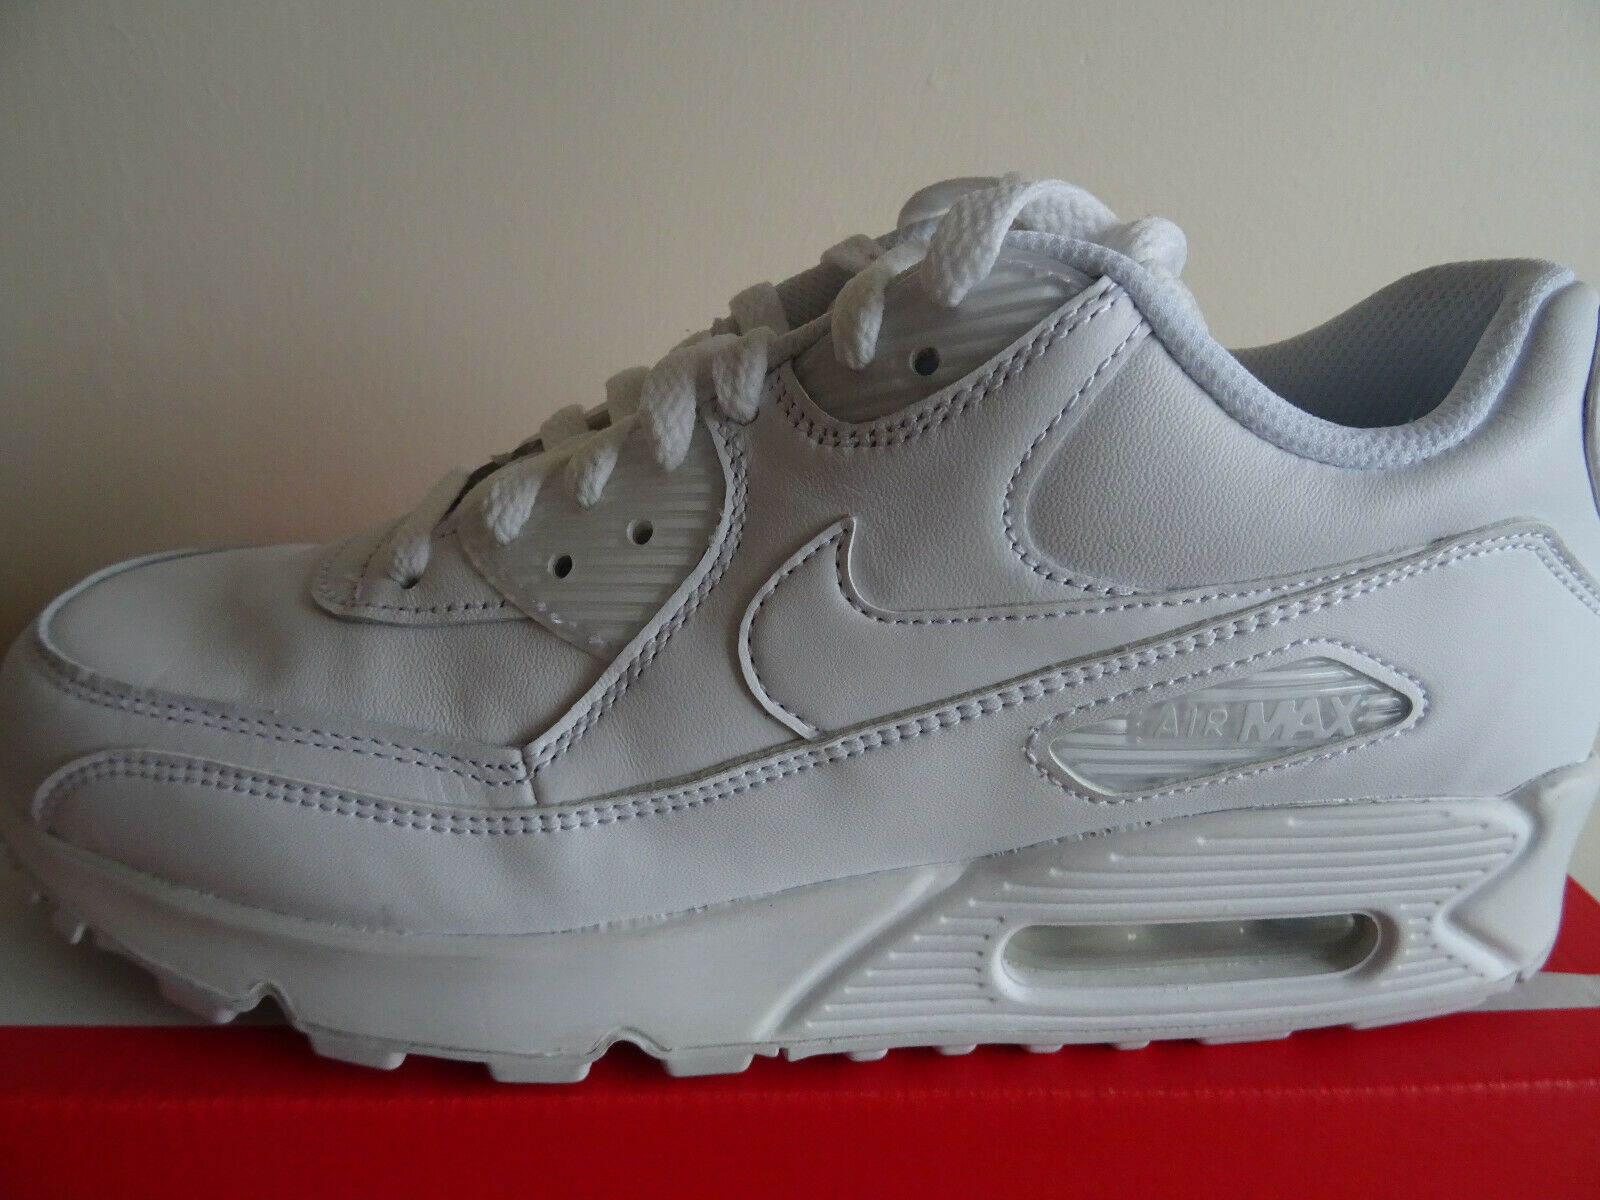 Nike Air Max 90 Leather mens trainers Turnschuhe schuhe 302519 113 NEW+BOX